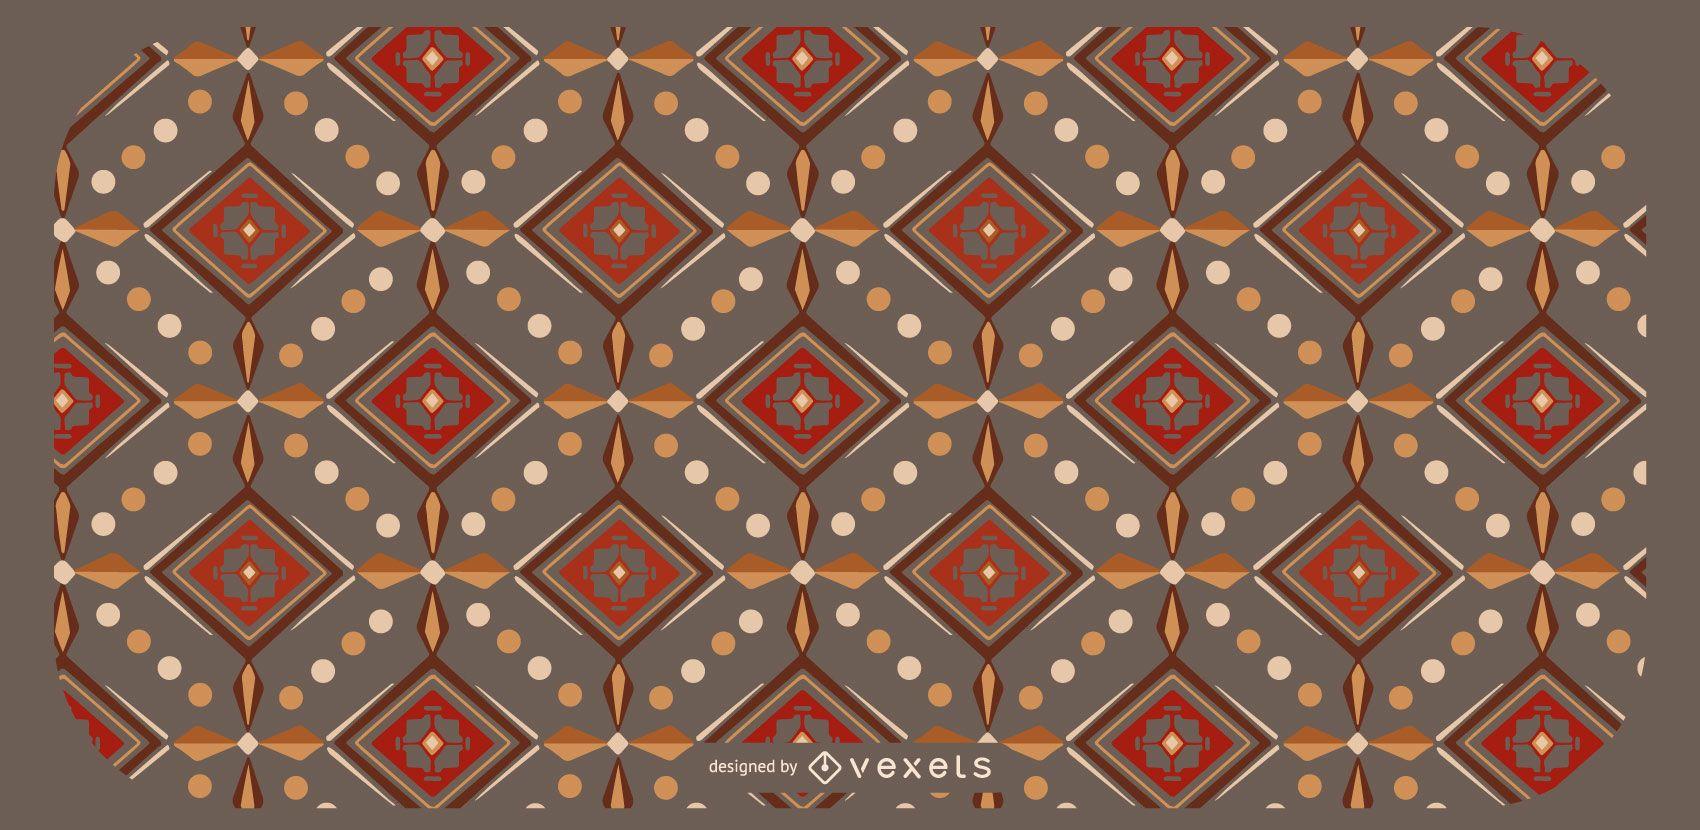 Aztec Geometrical Pattern Design